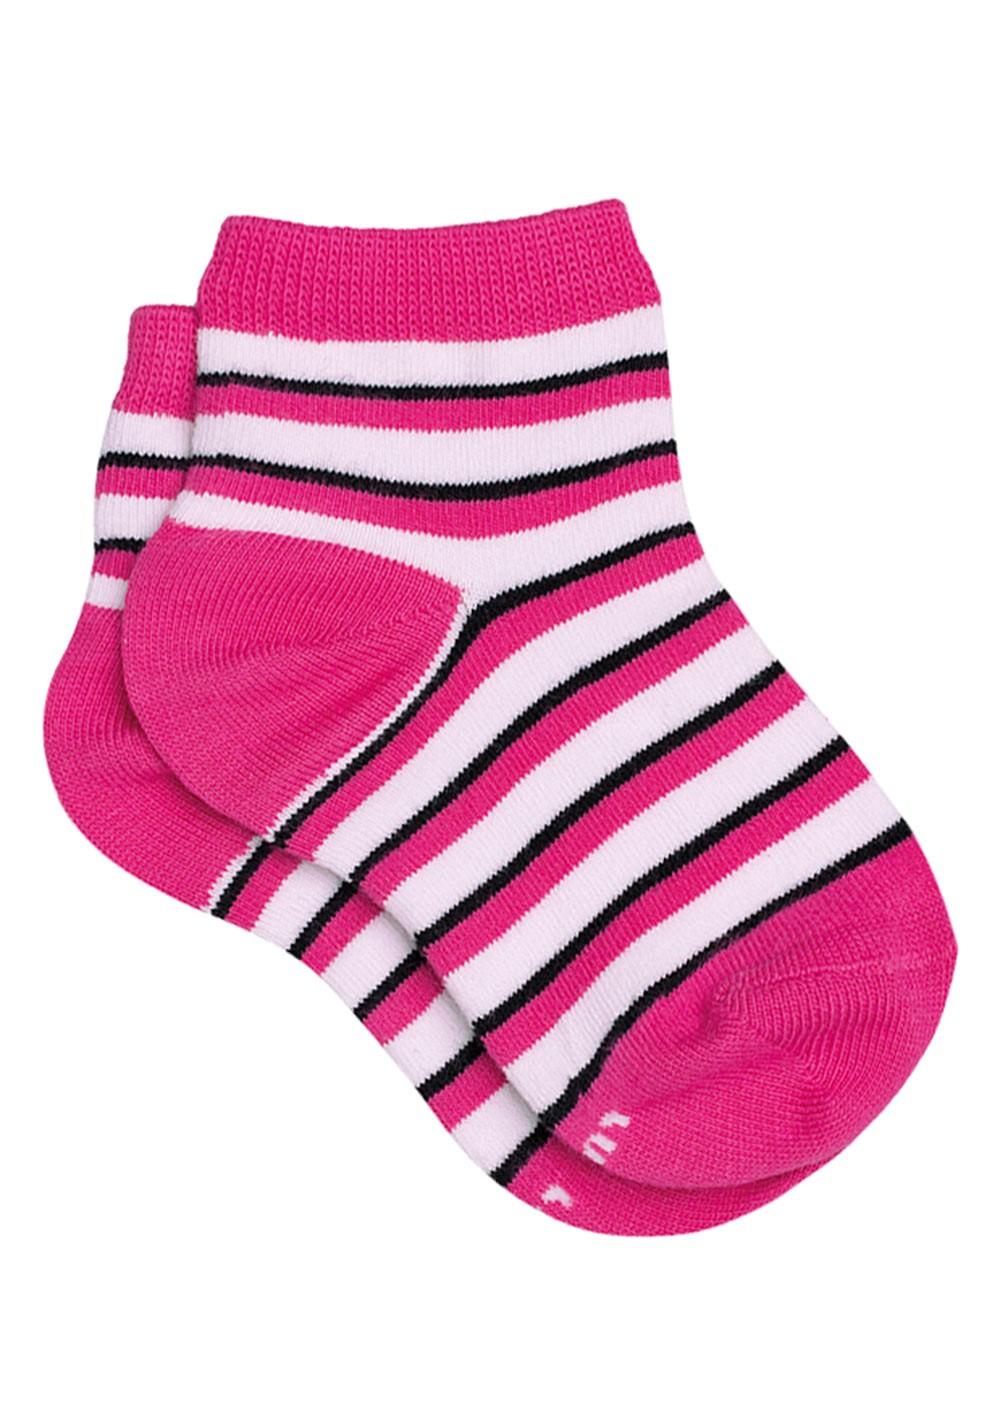 Meia com Cano Infantil Feminina Kit 3 Pink Listrada Lupo